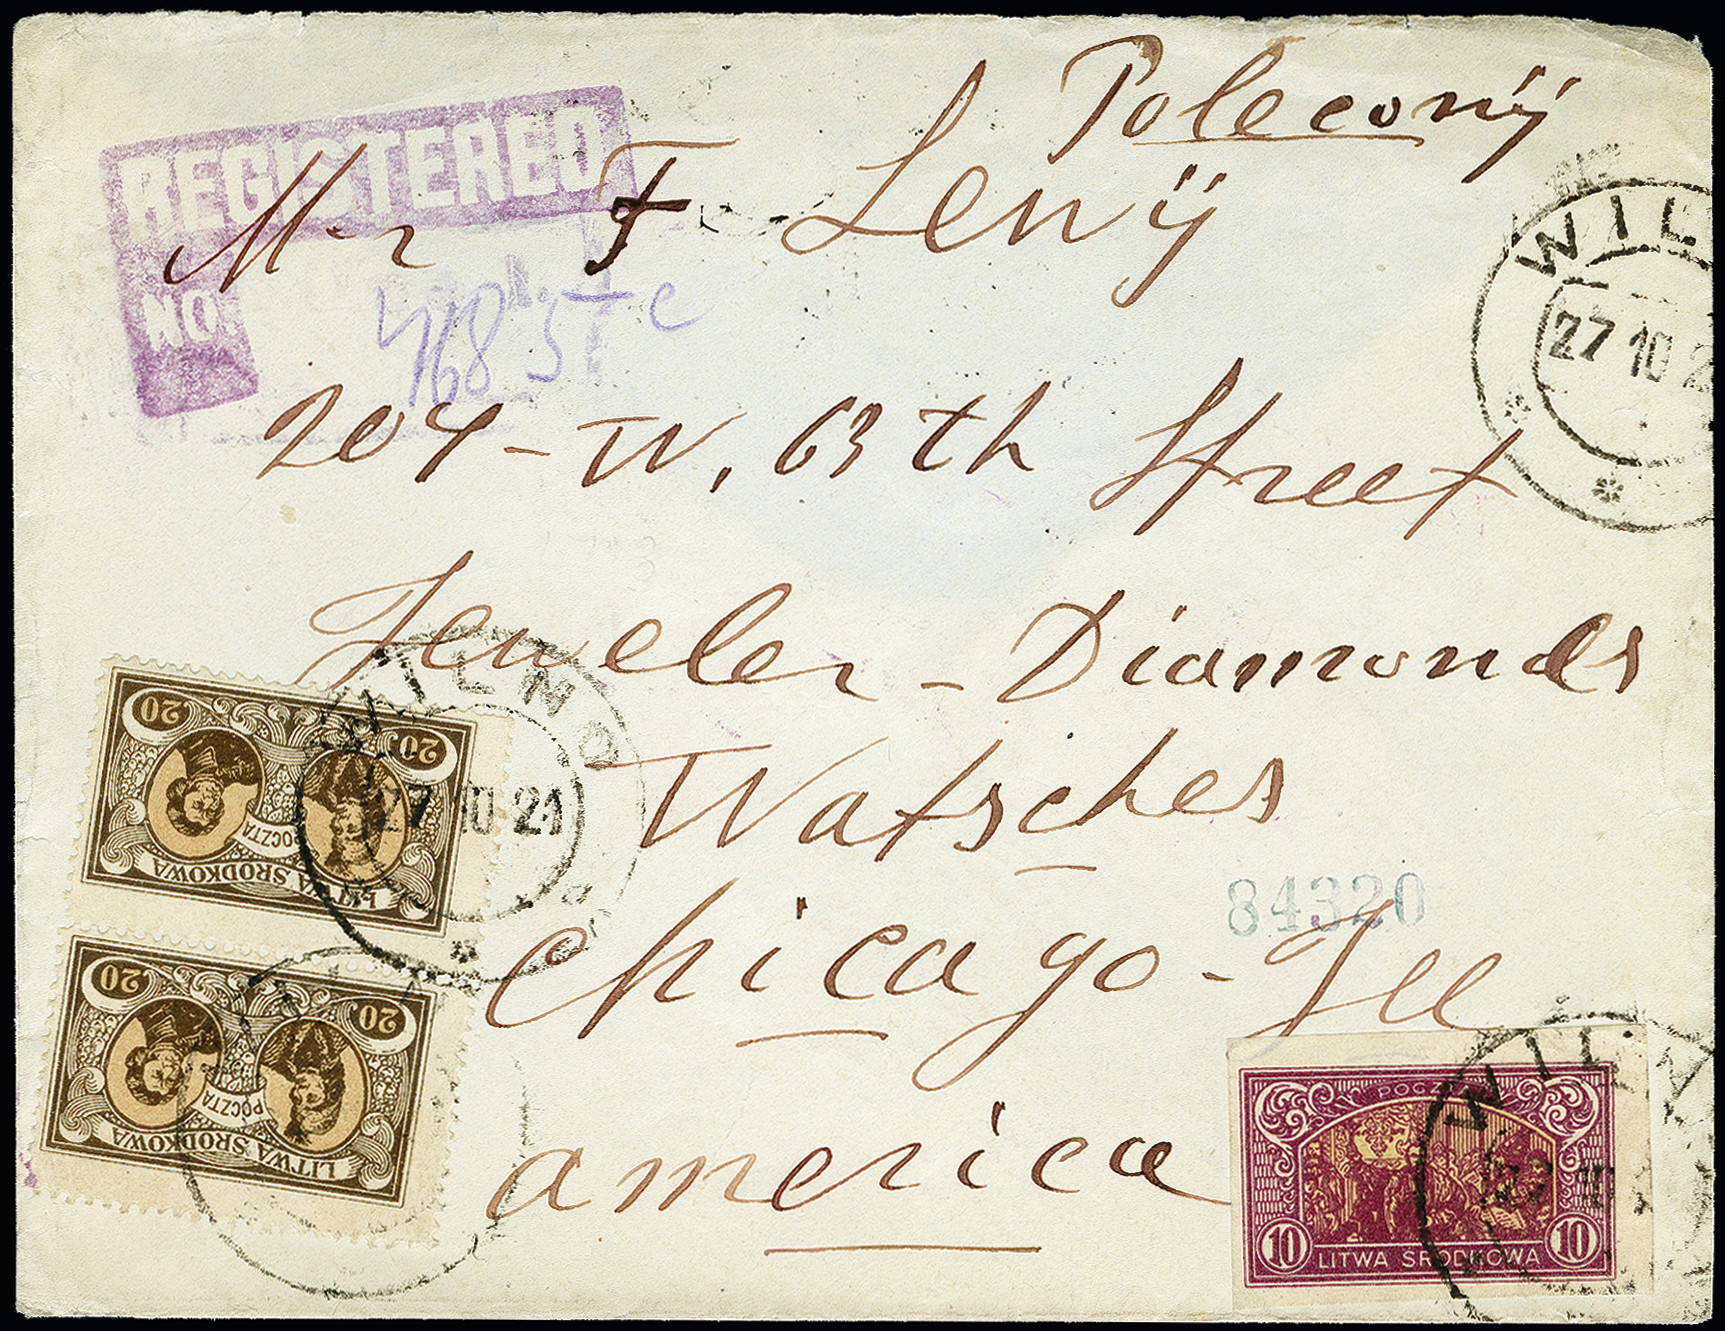 Lot 182 - europe central lithuania -  Heinrich Koehler Auktionen 373rd Heinrich Köhler auction - Day 1